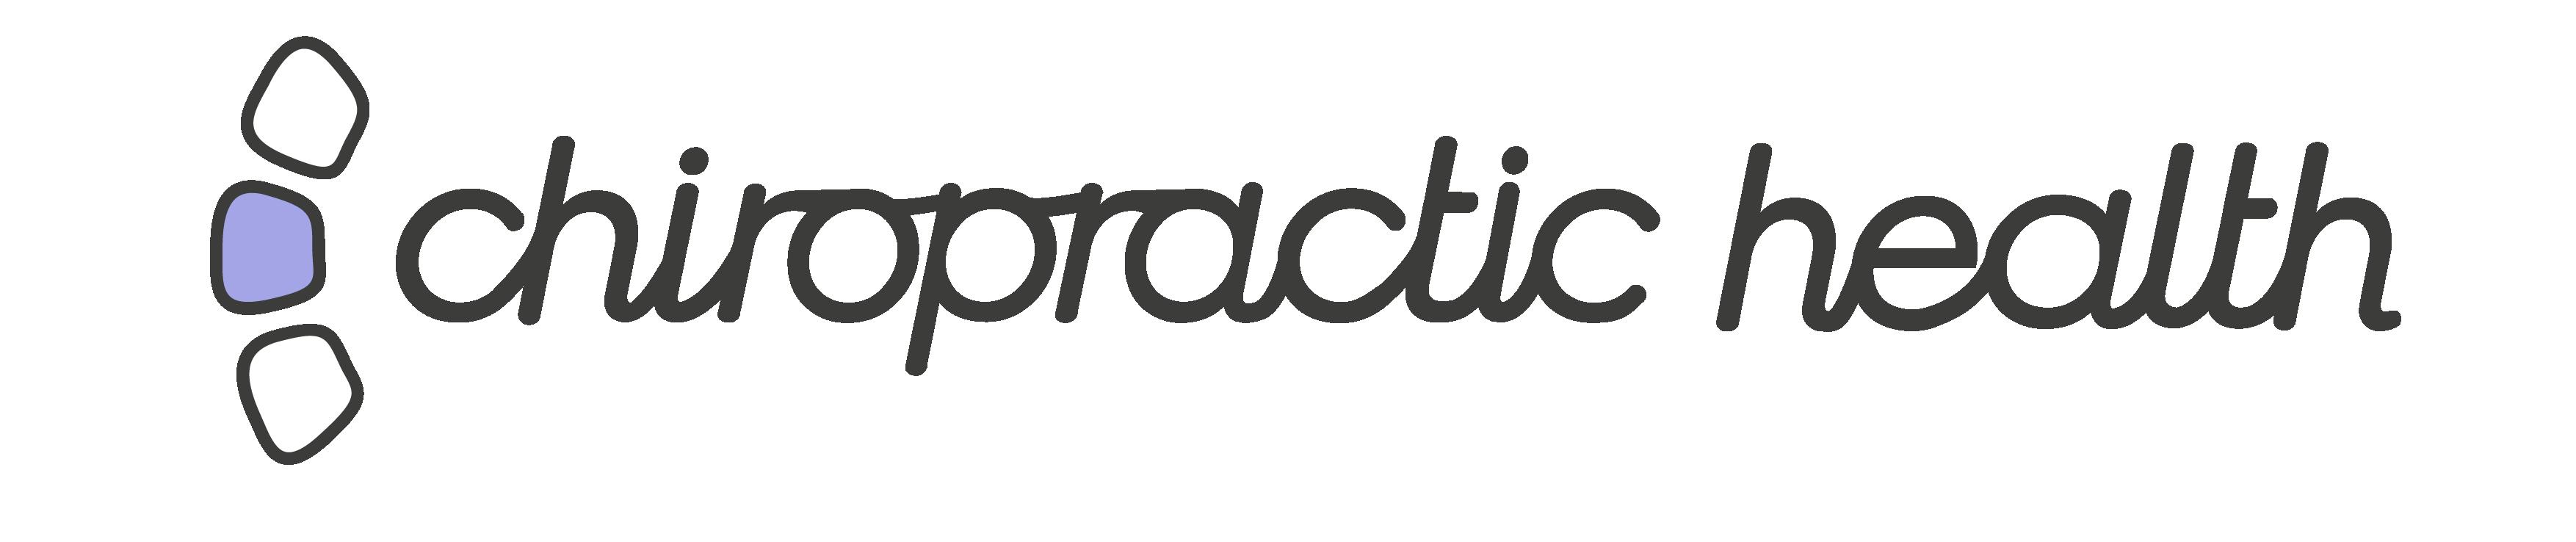 Chiropractic Health - Chiropractor in Edinburgh and Bathgate